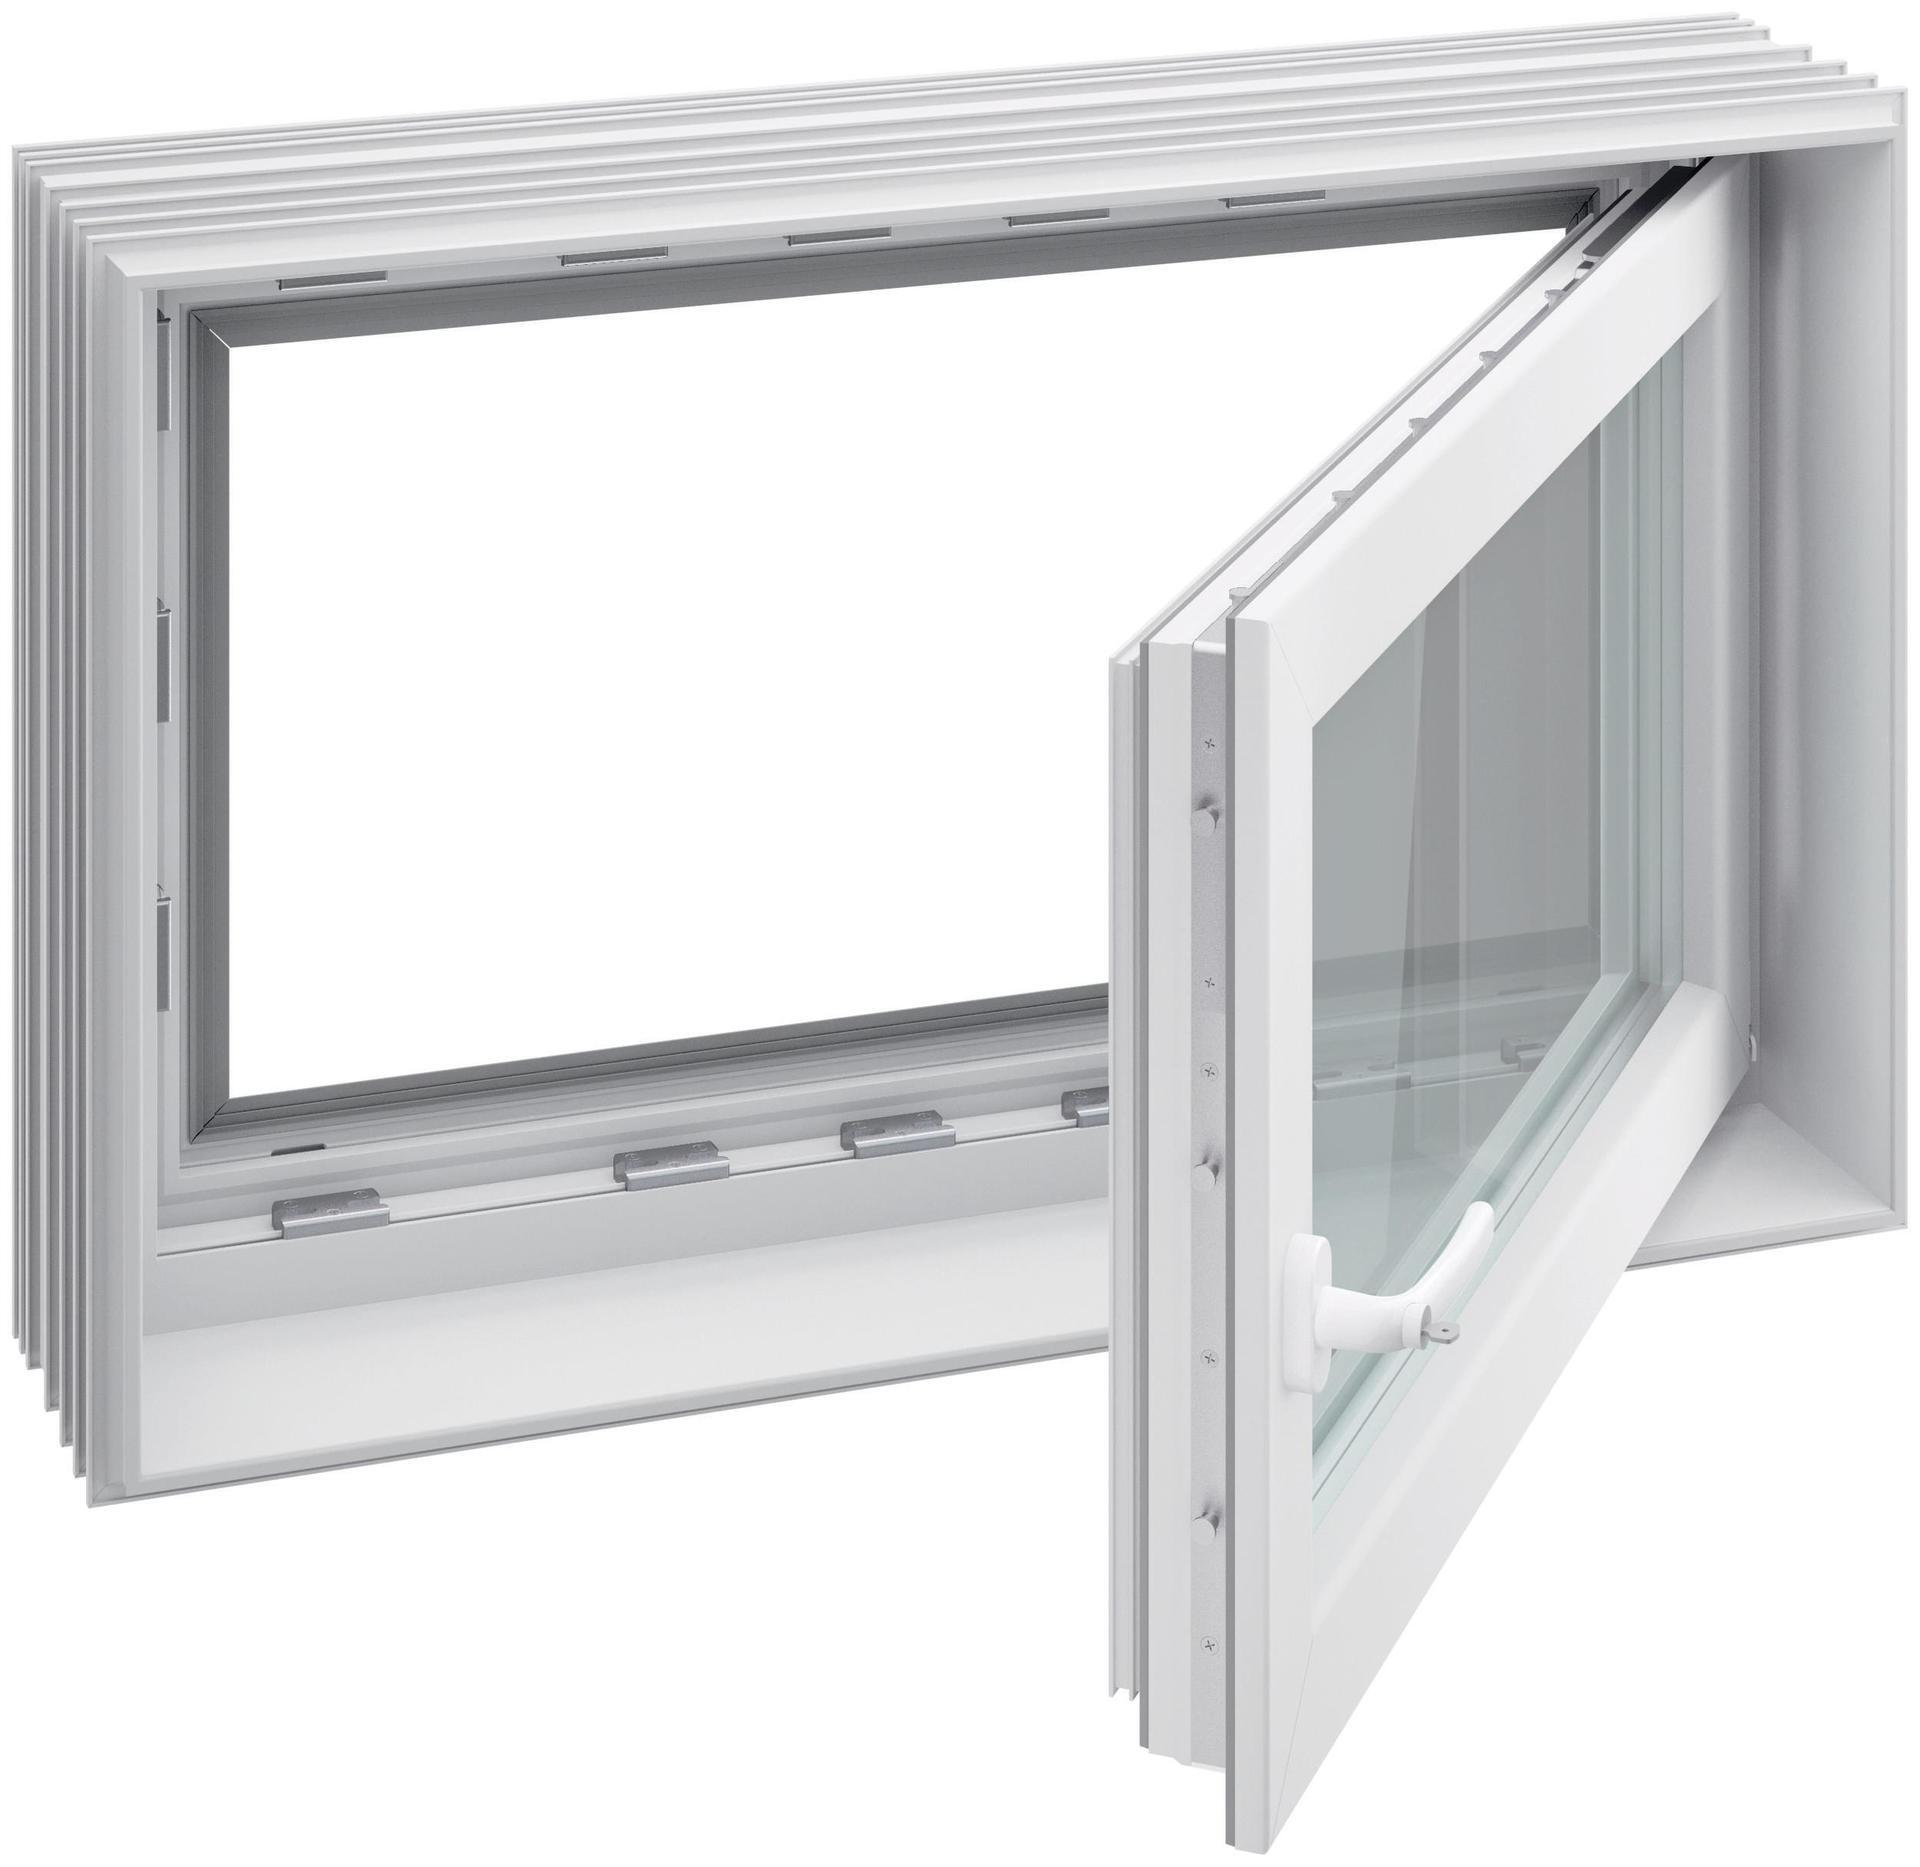 aco therm® 3.0 leibungsfenster für den keller - ais-online.de